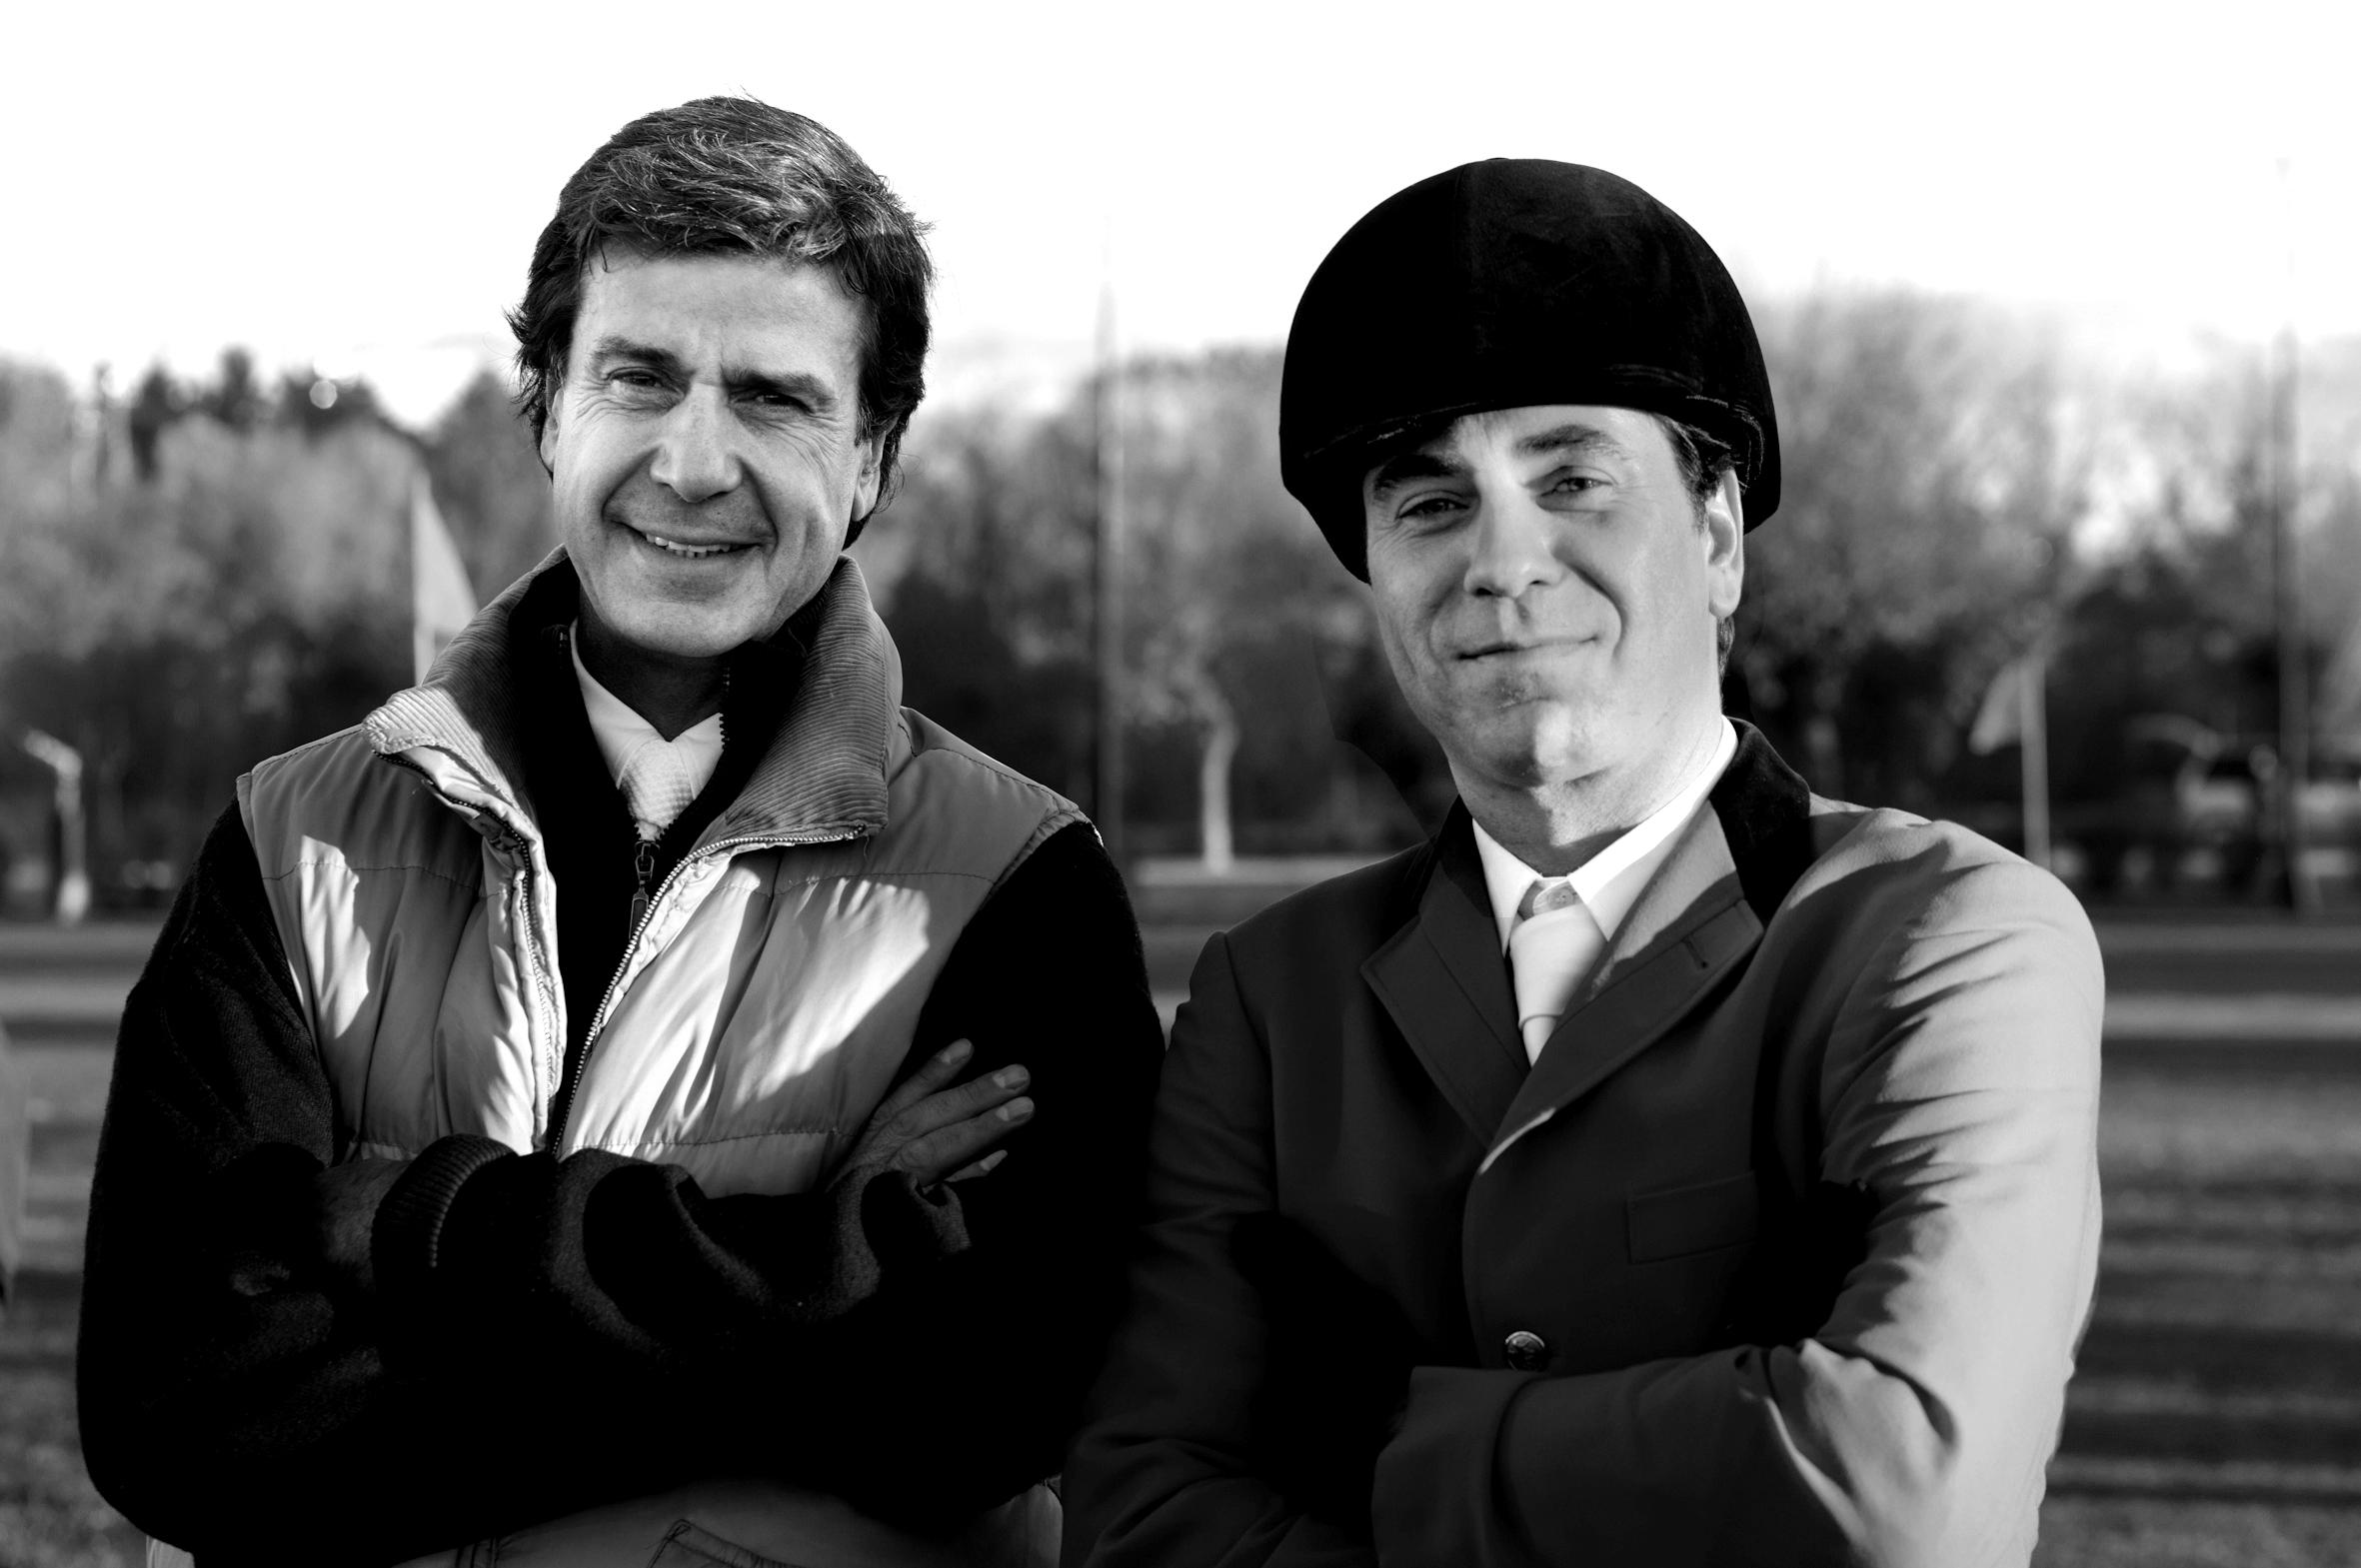 Cayetano Fitz-James Stuart y Javier Collado